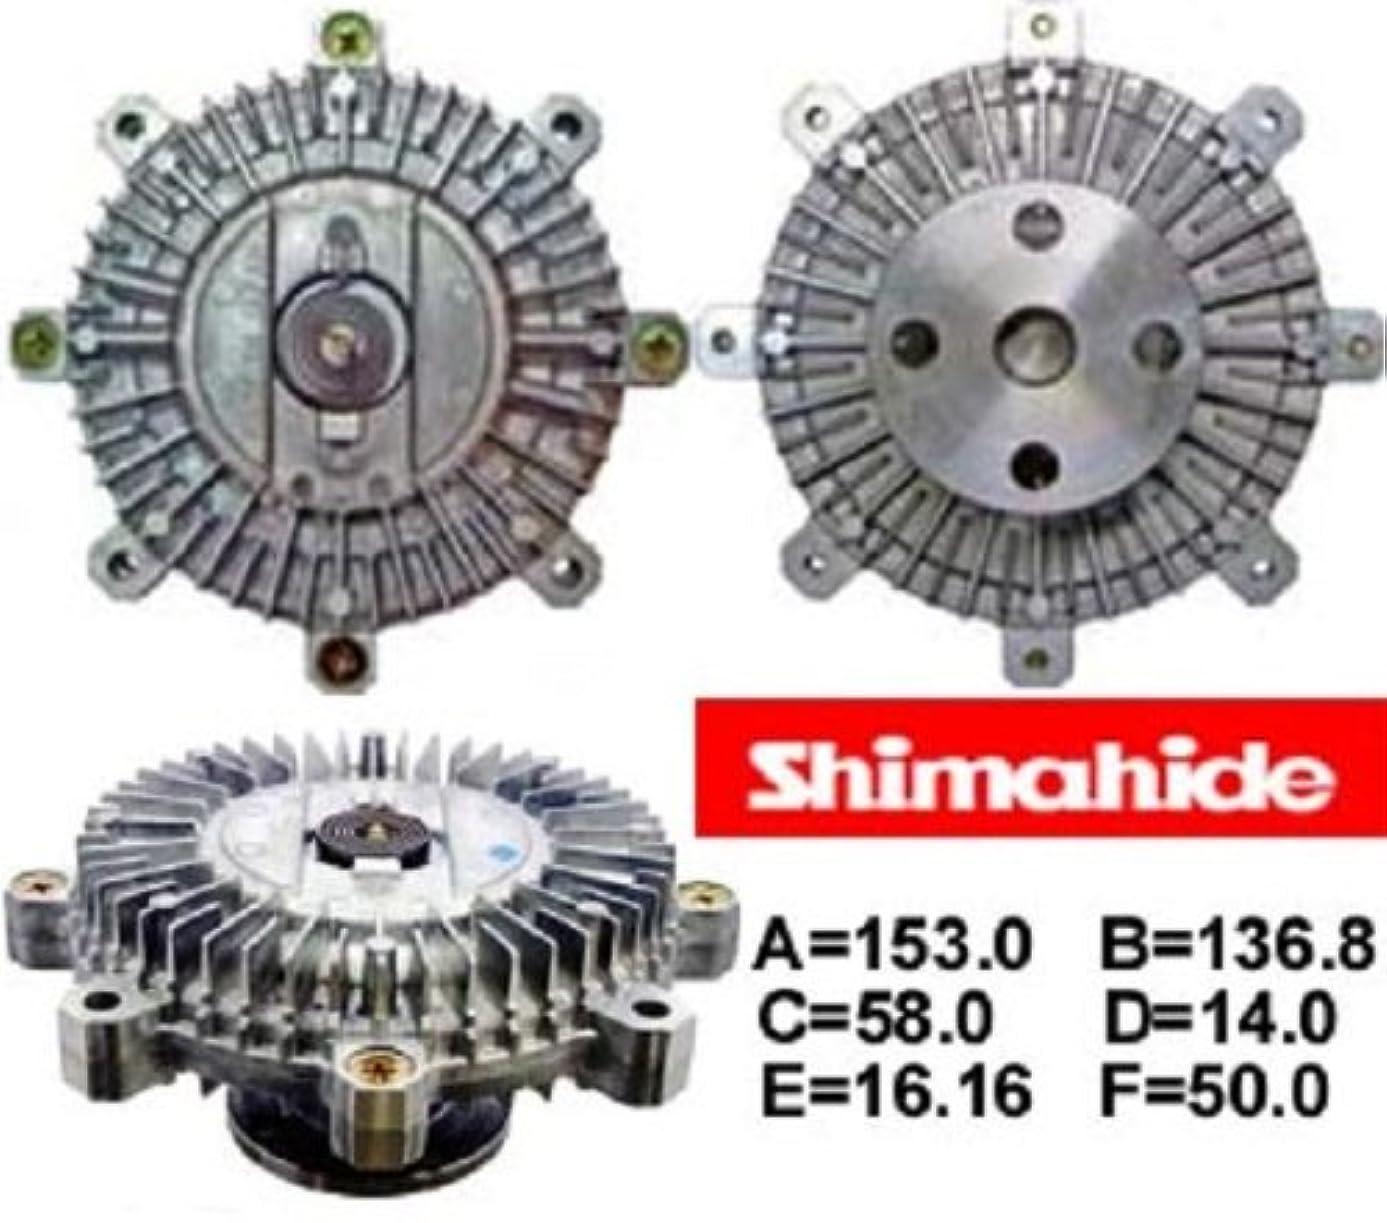 SHIMAHIDE FAN CLUTCH ISUZU PICKUP TROOPER V6 89-94